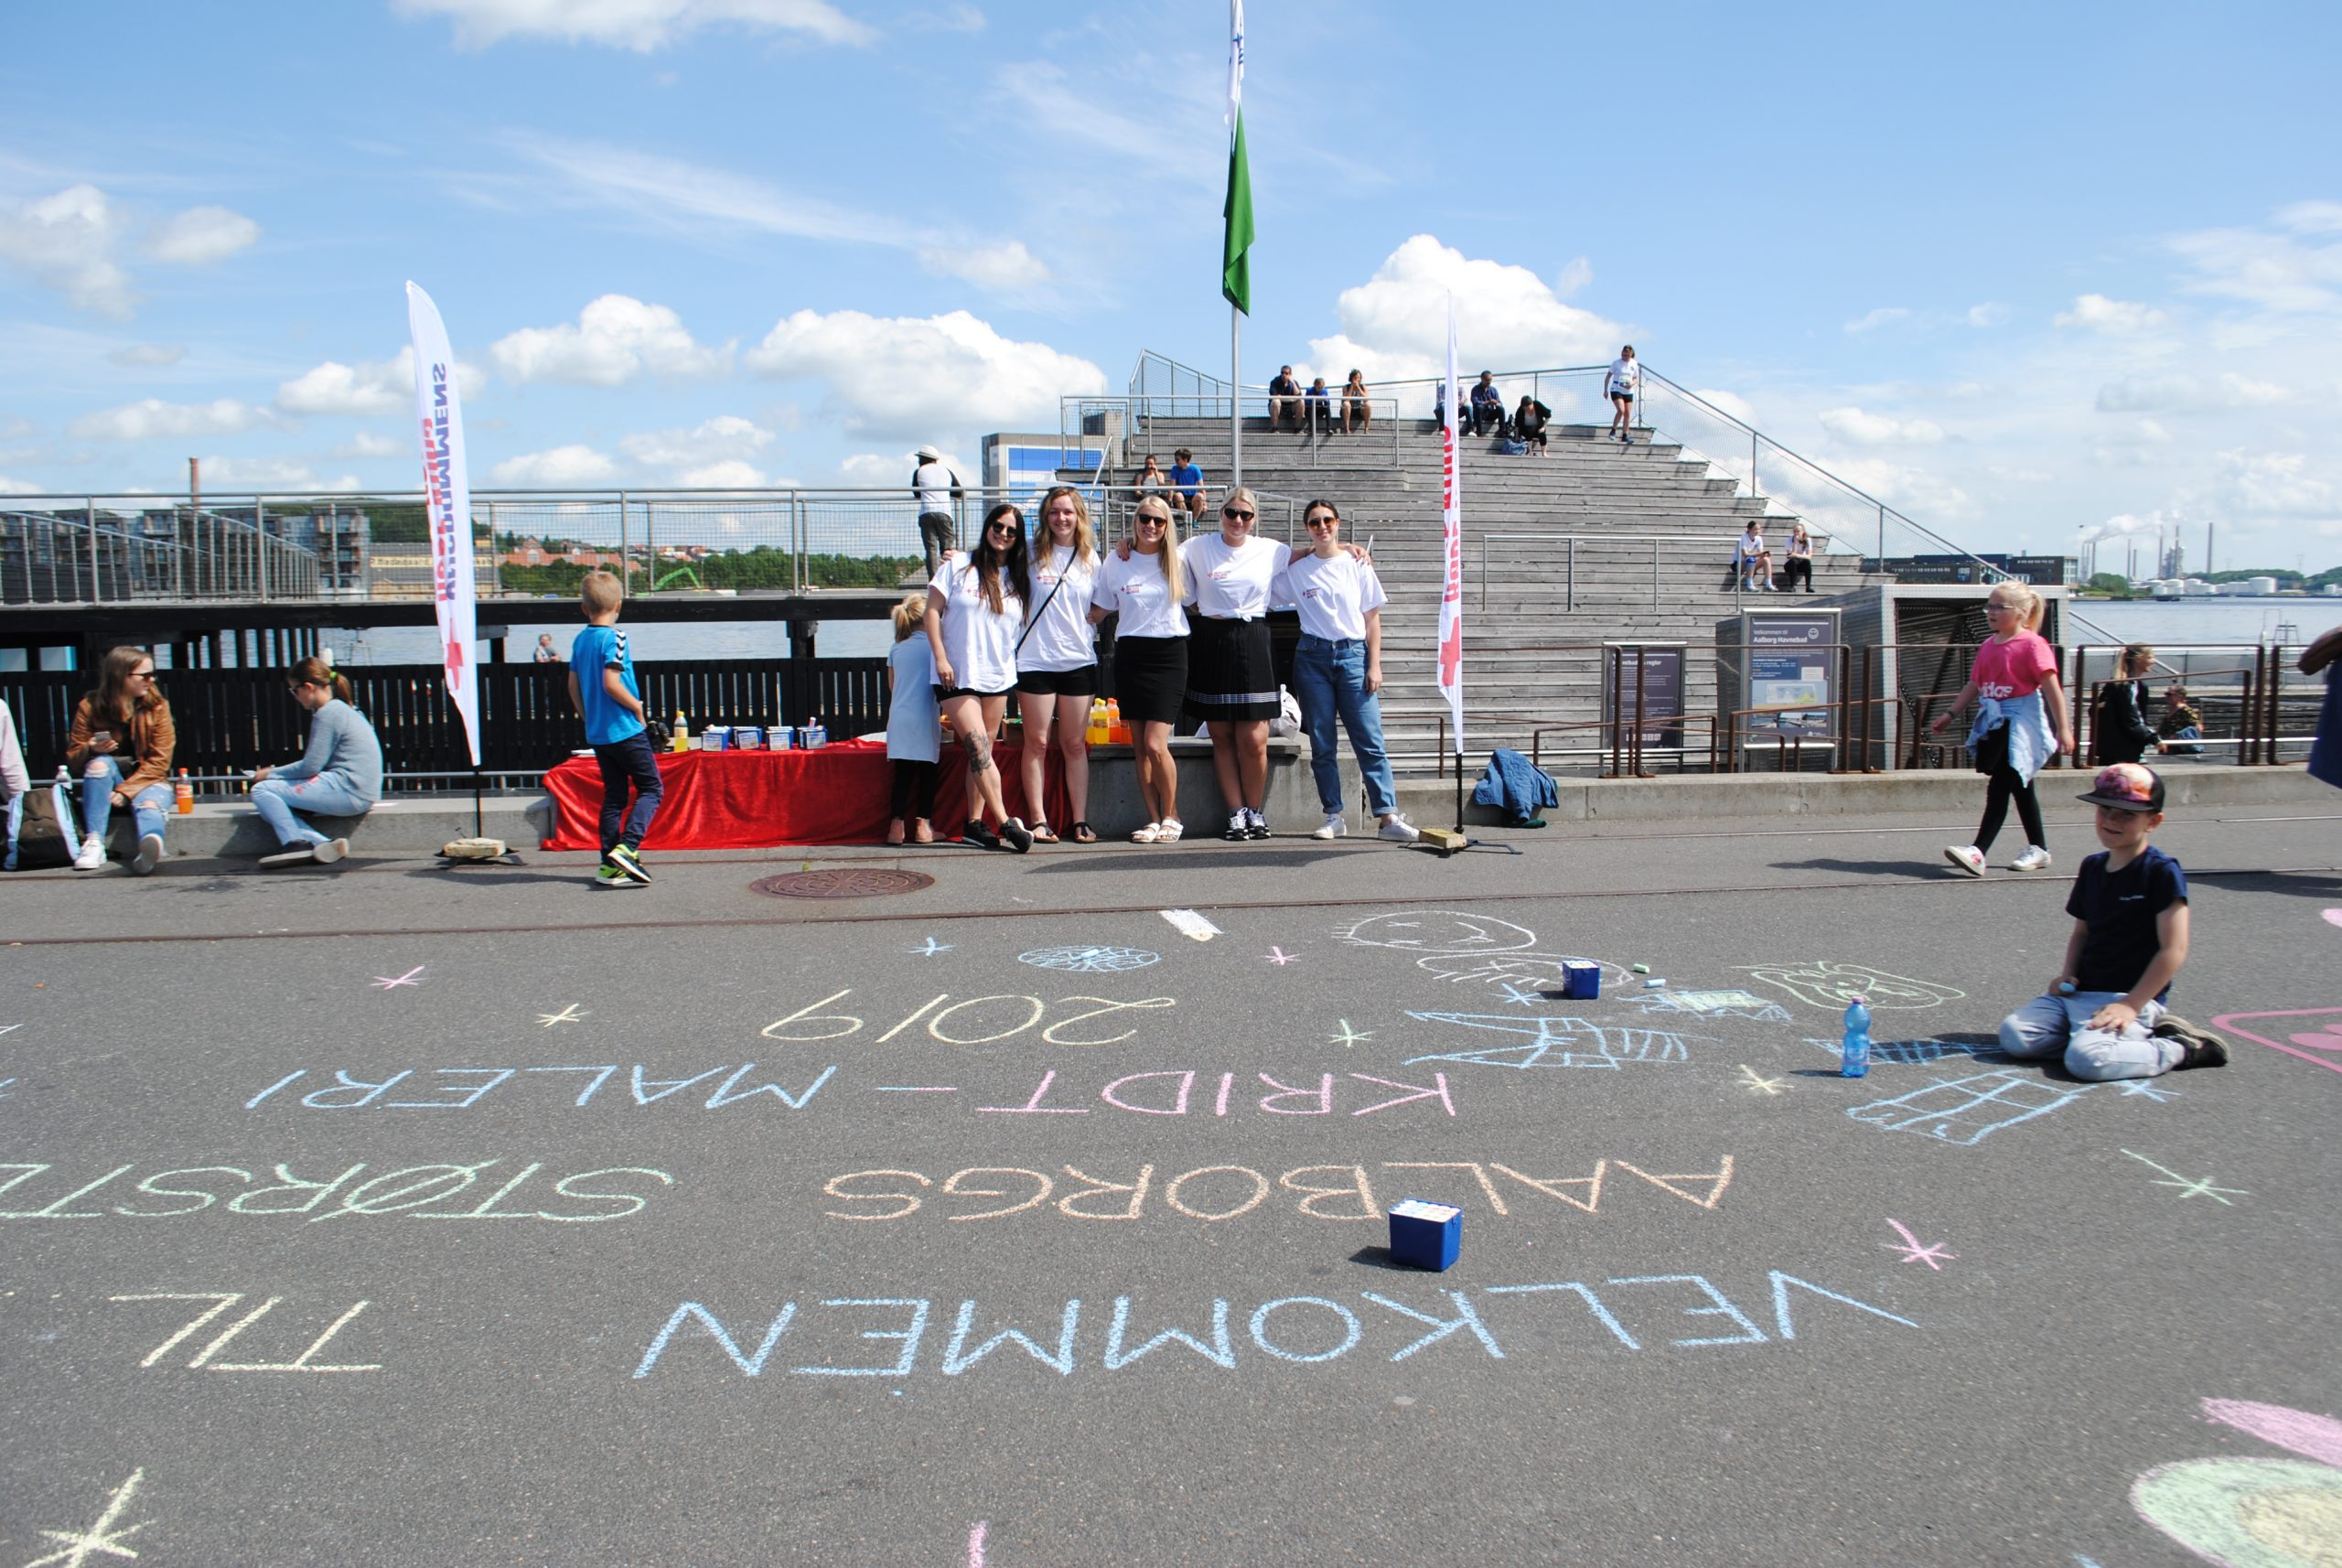 Kridt, kreativitet og kunst: Vær med til at lave Aalborgs største kridtmaleri